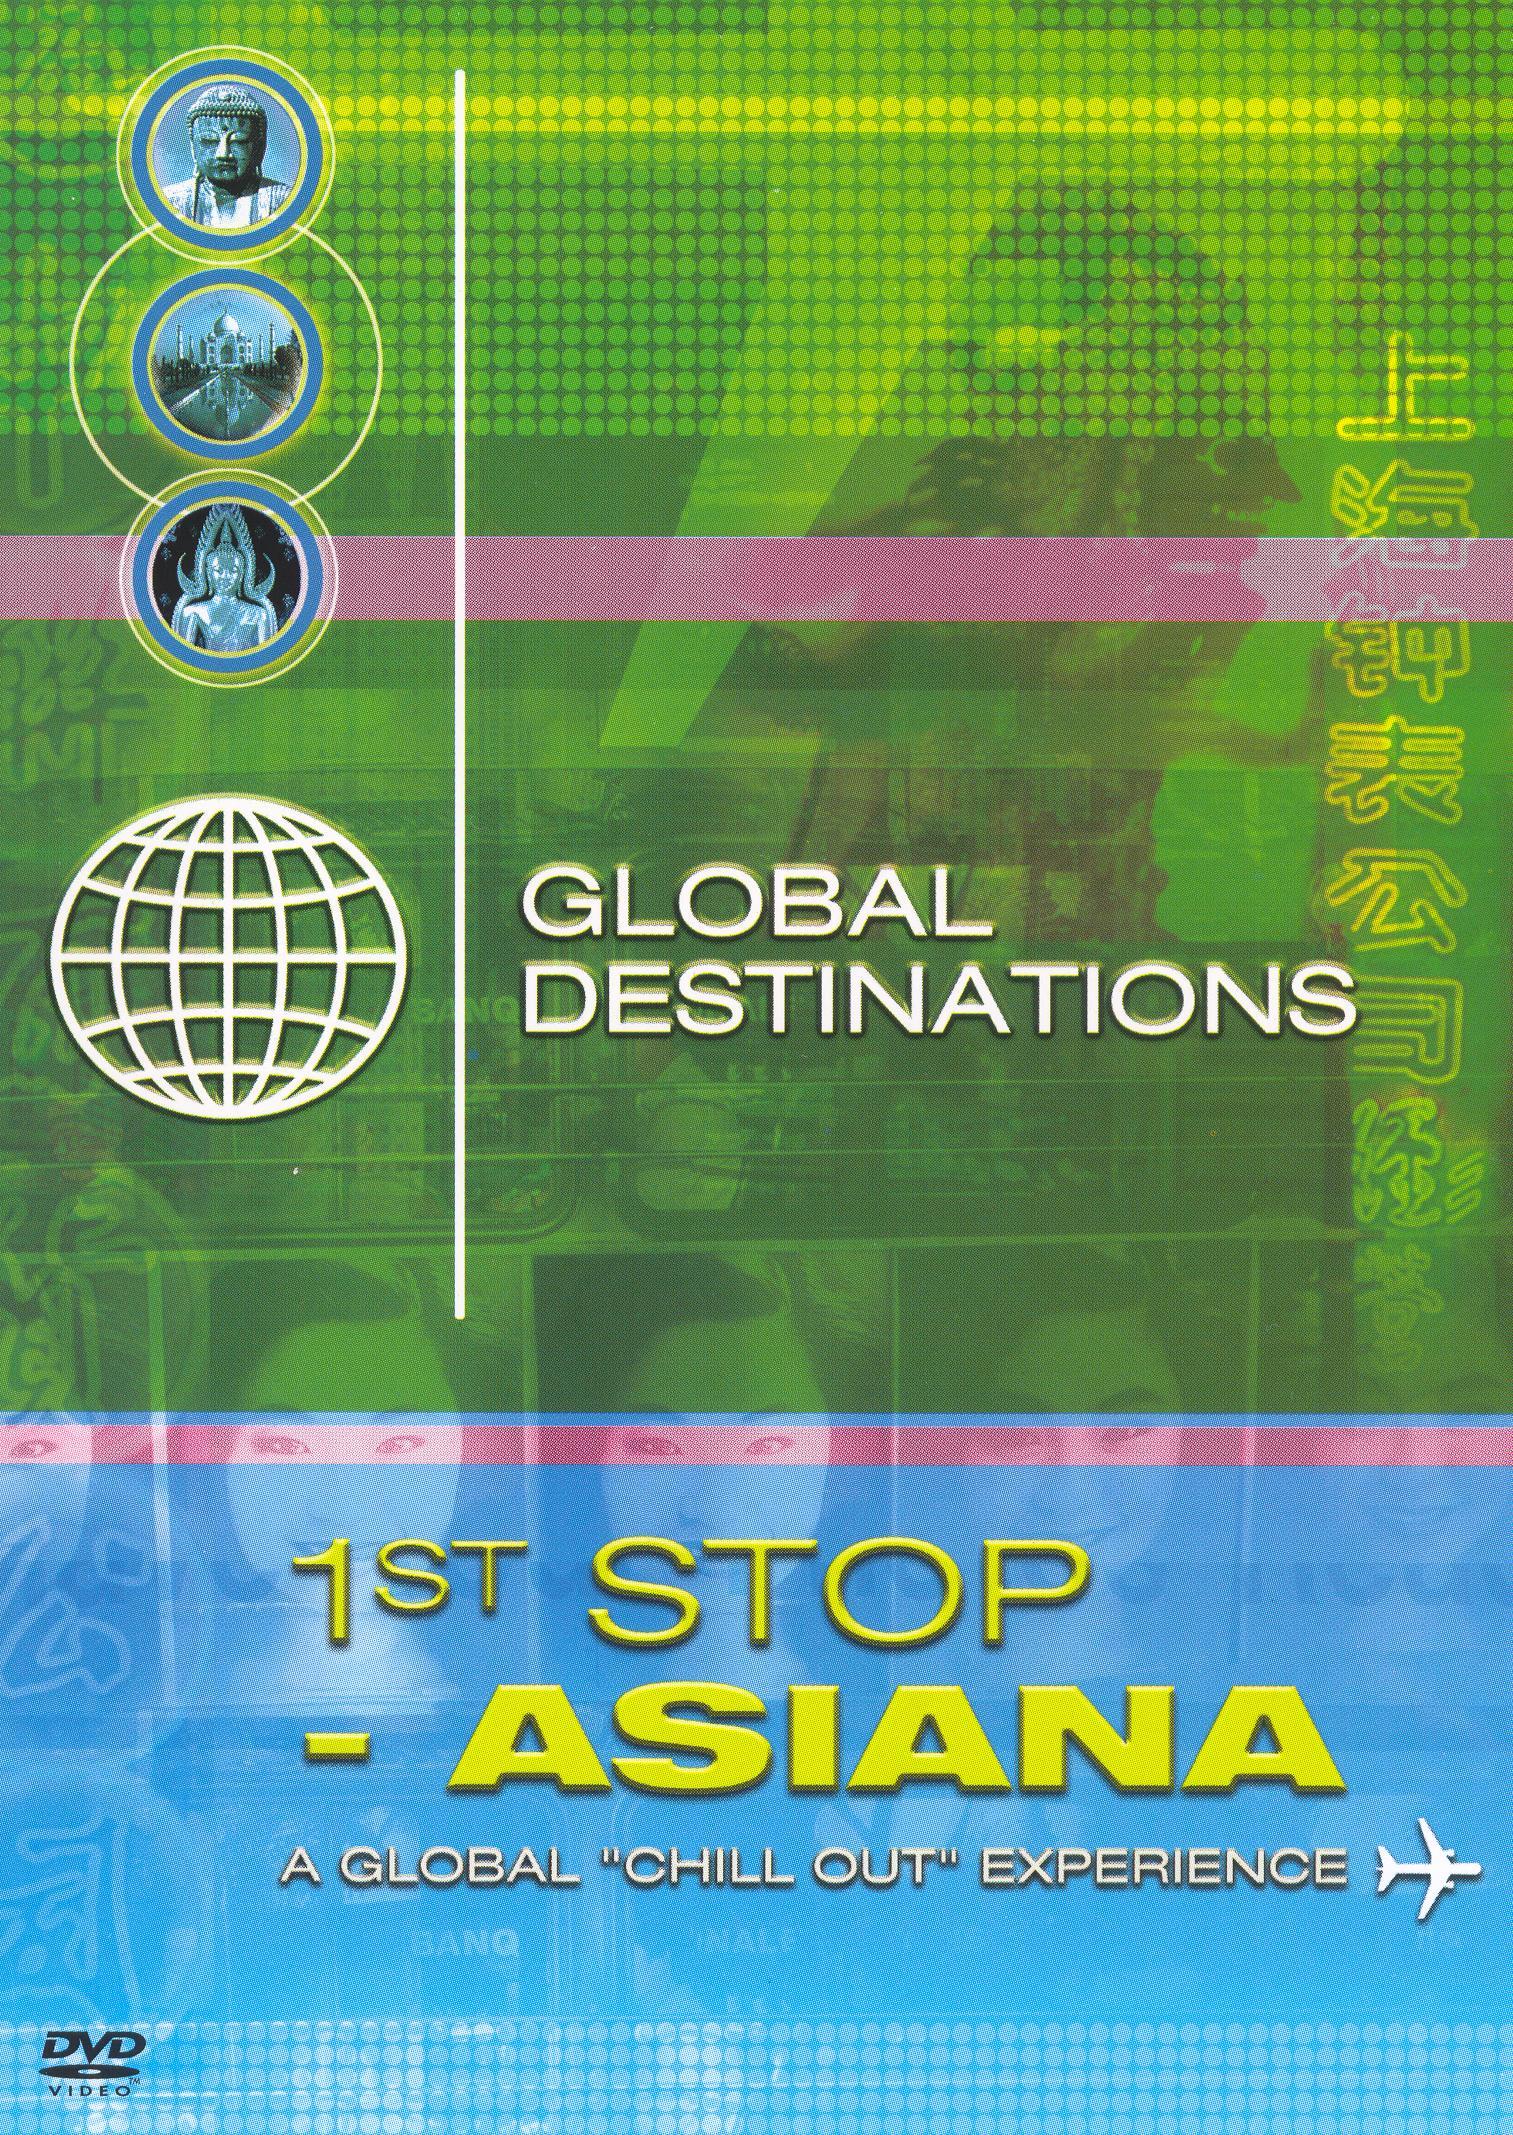 Global Destinations: 1st Stop - Asiana